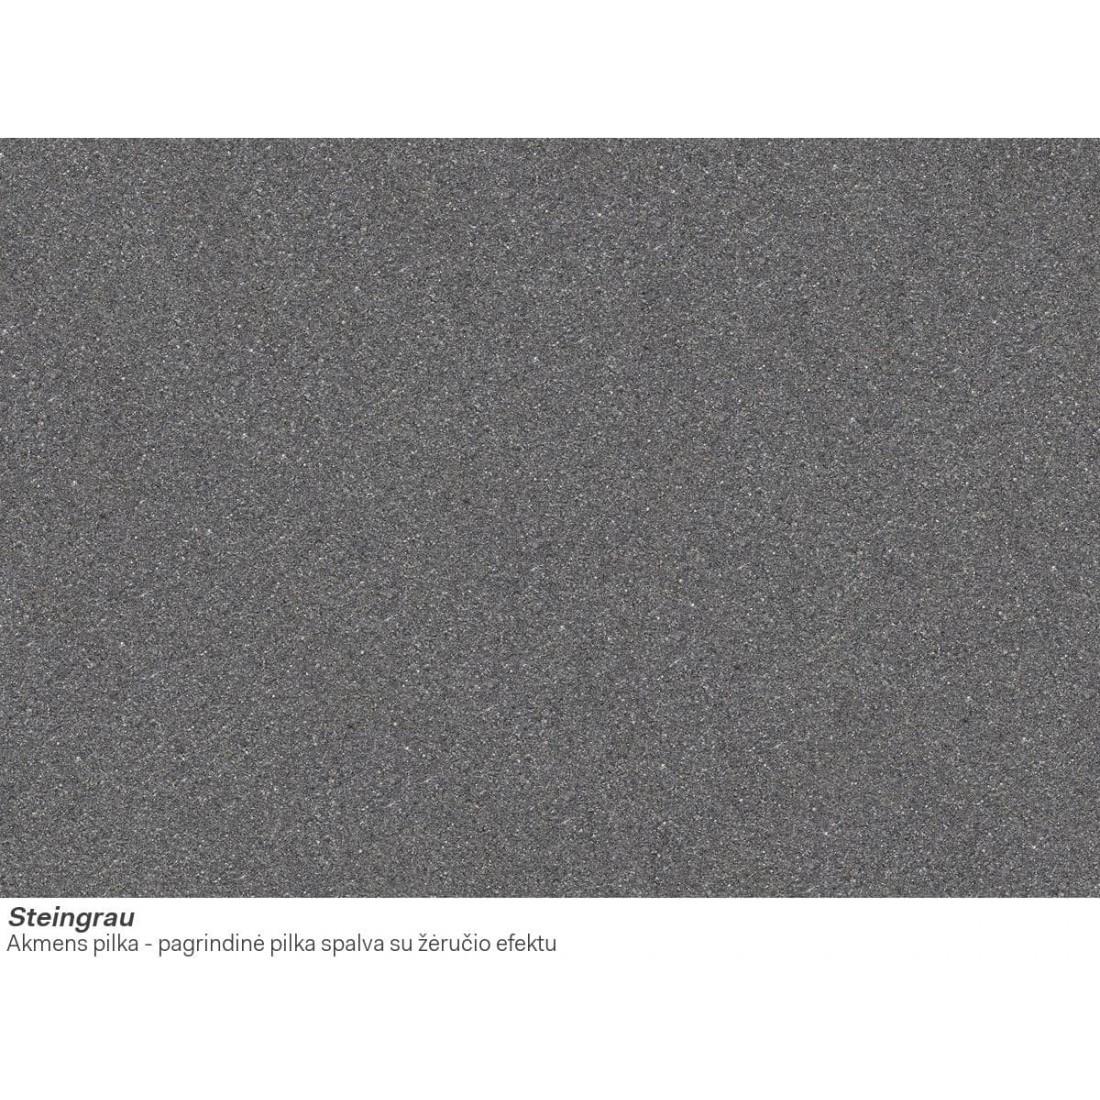 Akmens masės plautuvė Franke Maris MRG 610-58, Akmens pilka